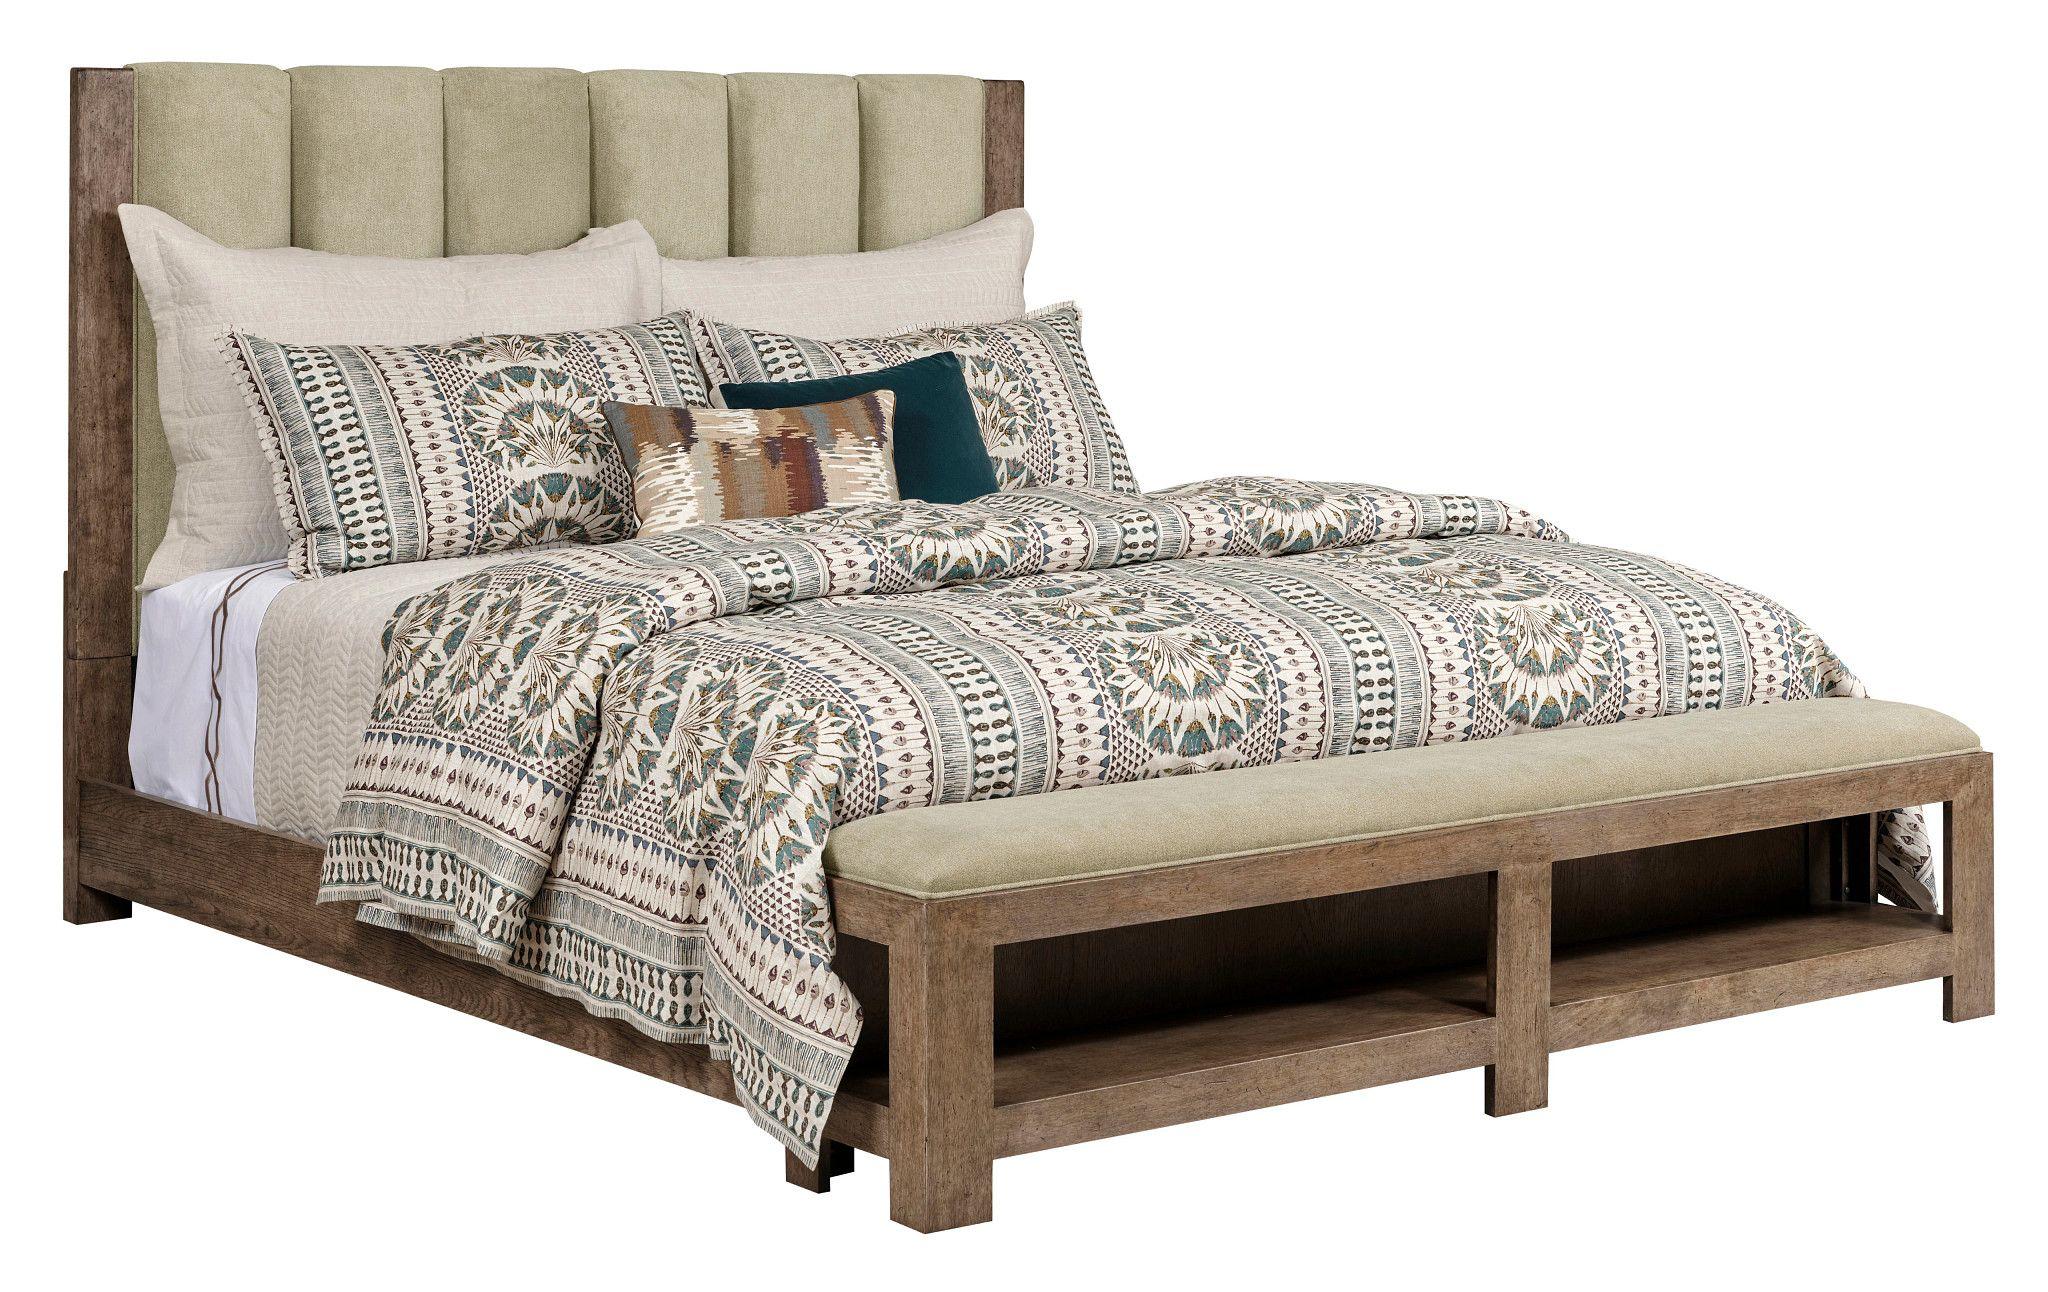 Queen Meadowood Upholstered Bed